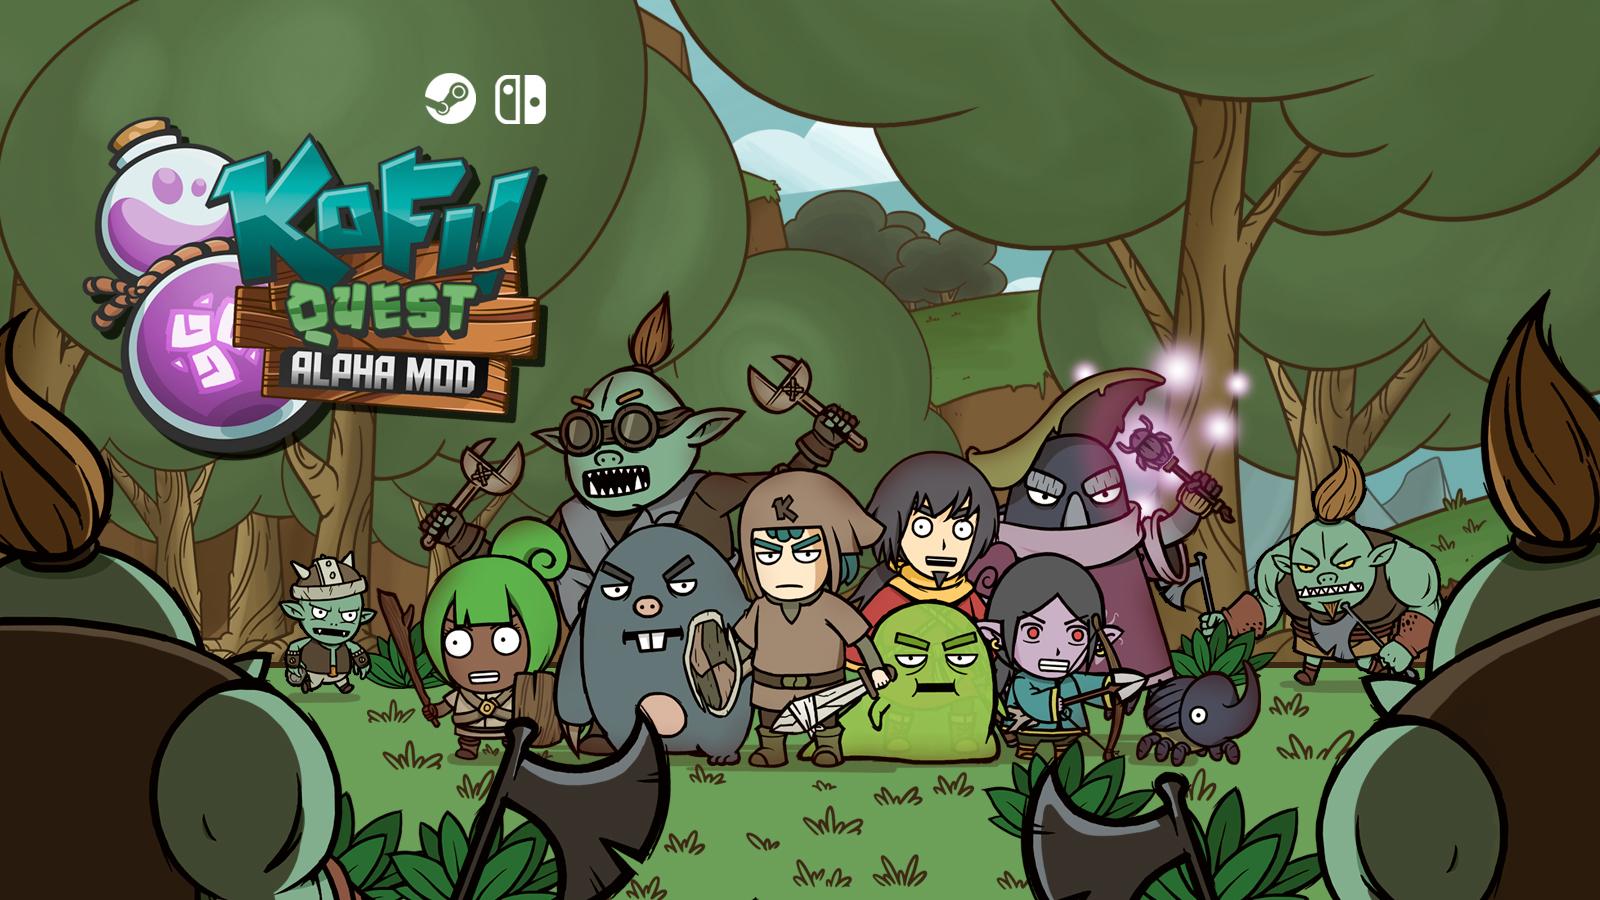 Kofi Quest: Alpha MOD on Steam